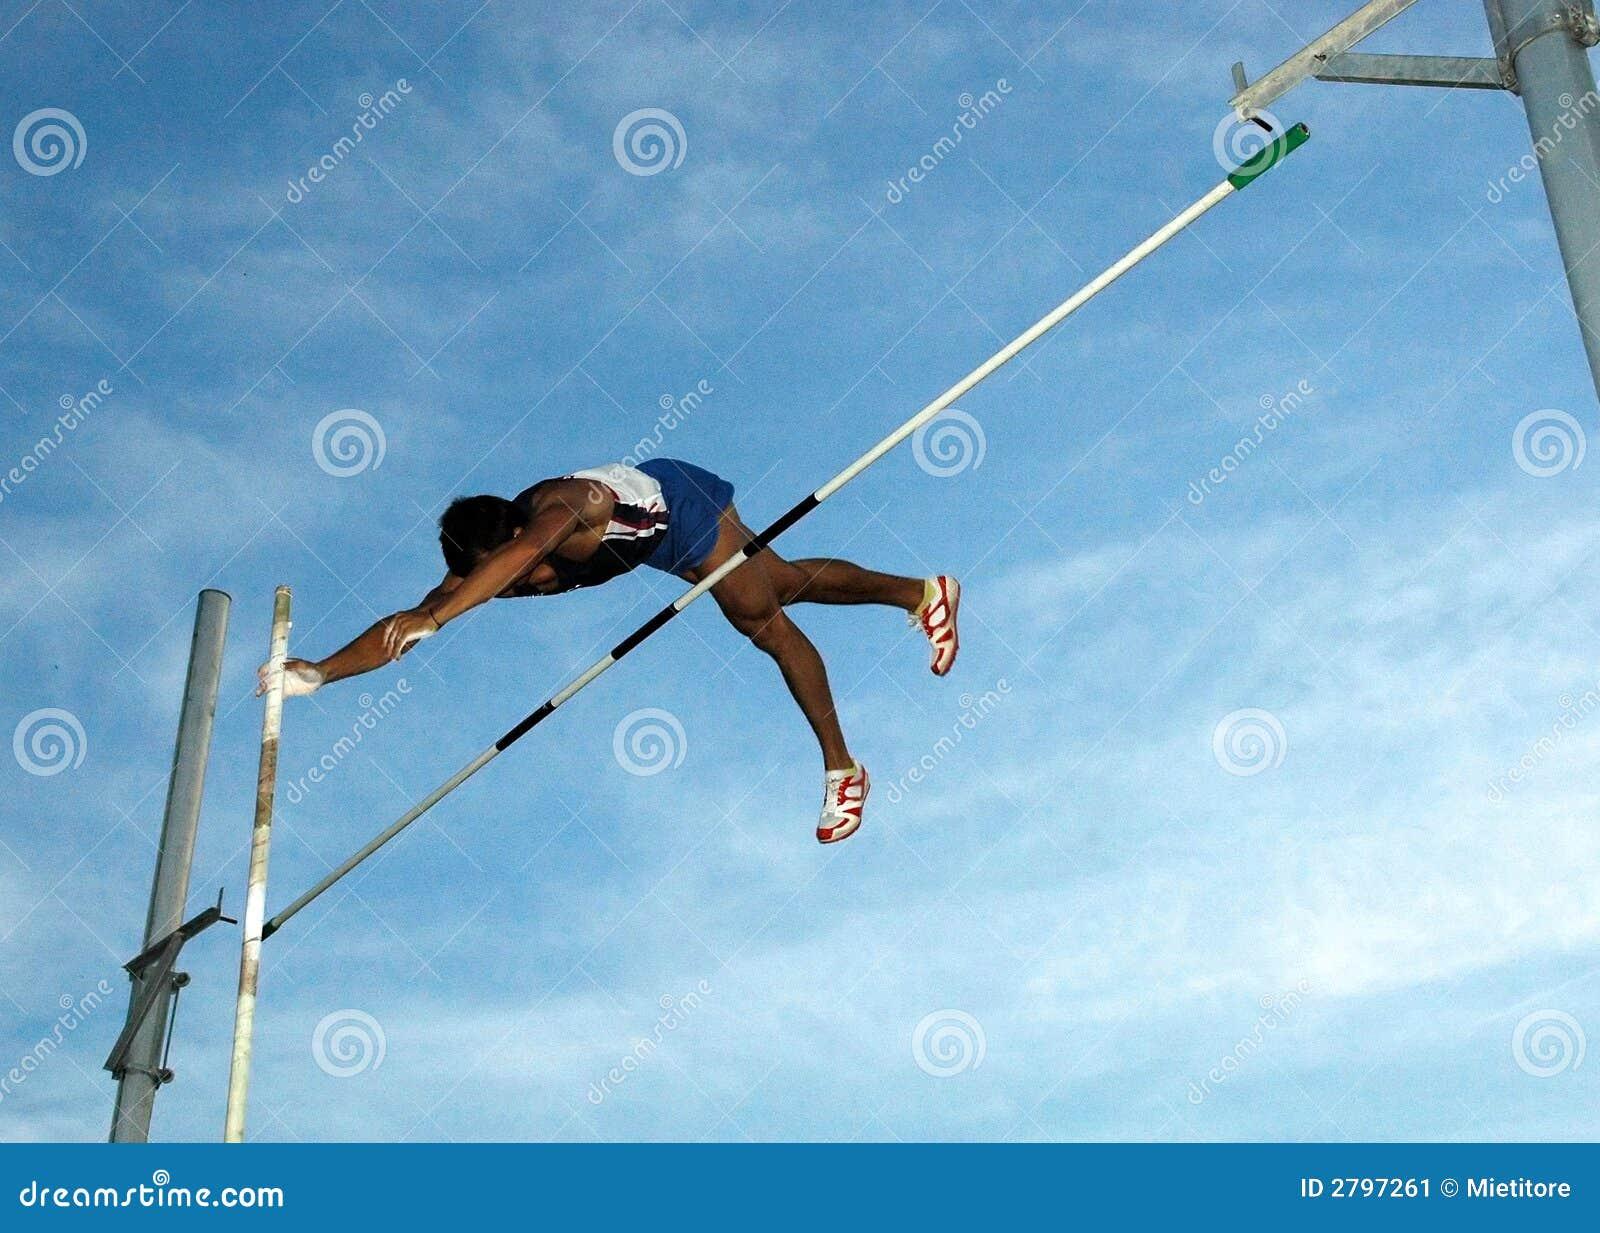 Pole-Vaulting